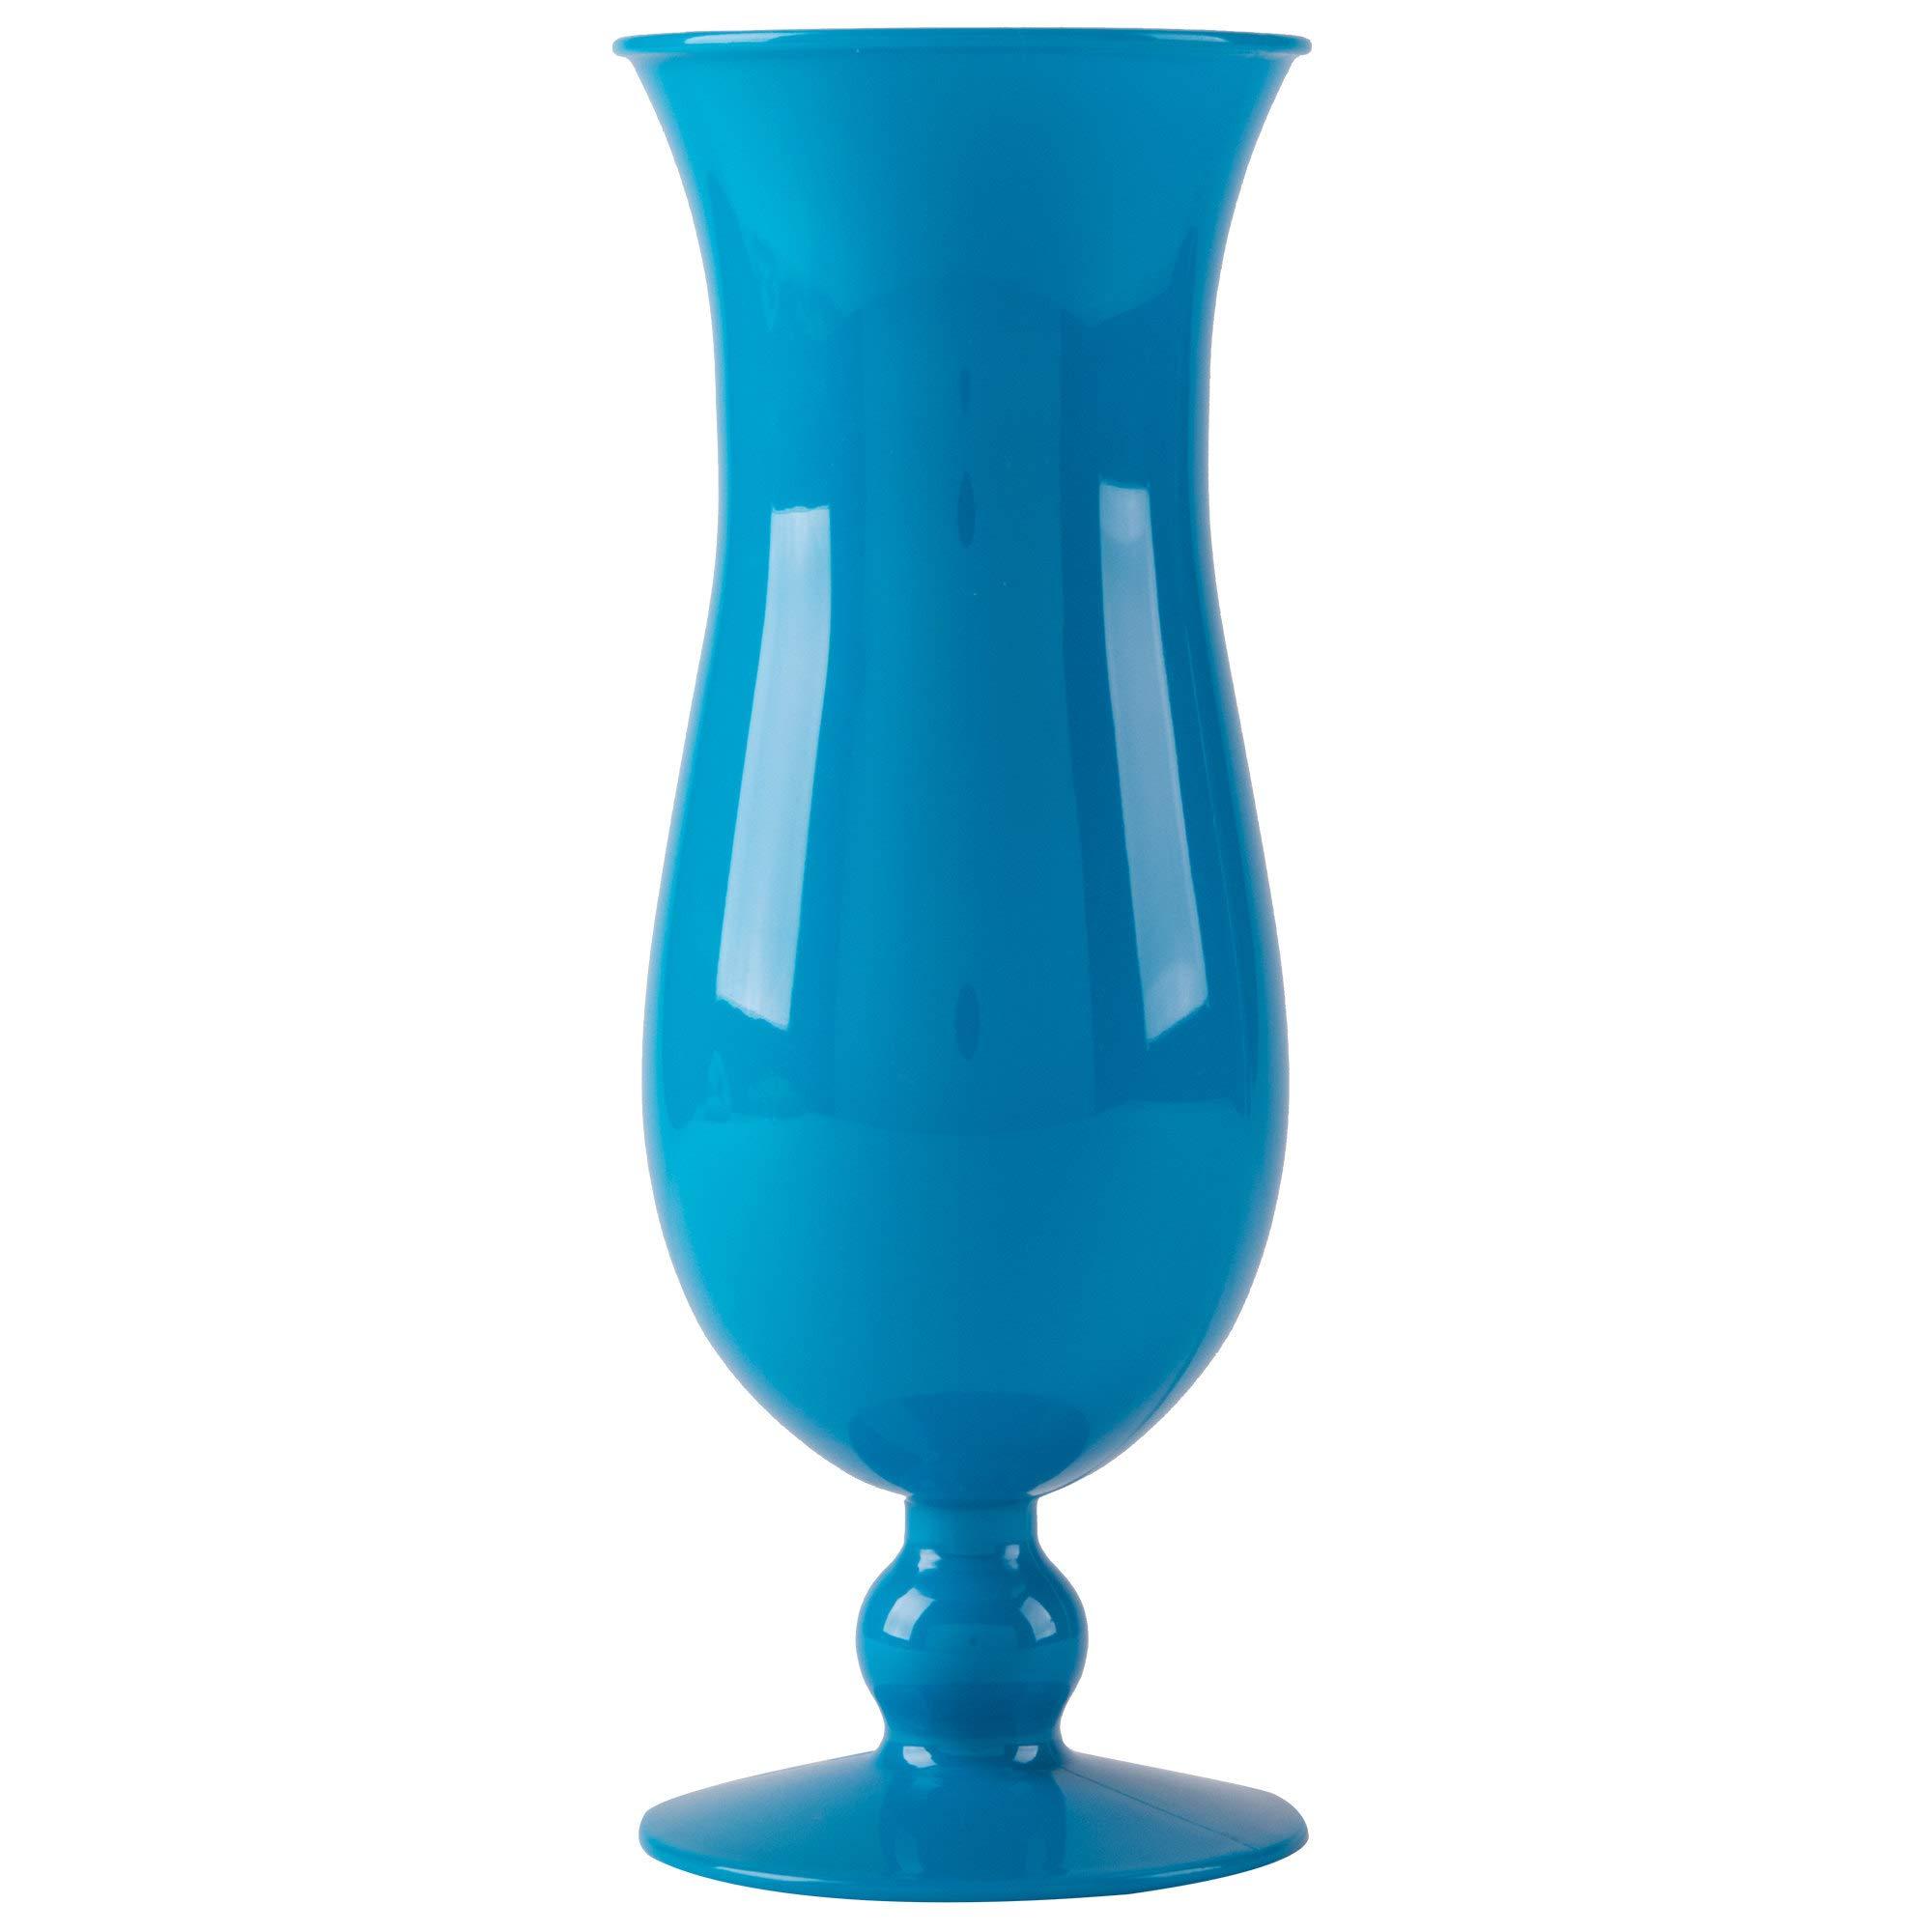 15 oz. Blue Plastic Hurricane Glasses, Break Resistant, Dishwasher Safe, Reusable, GET HUR-1-BL (Qty, 12)